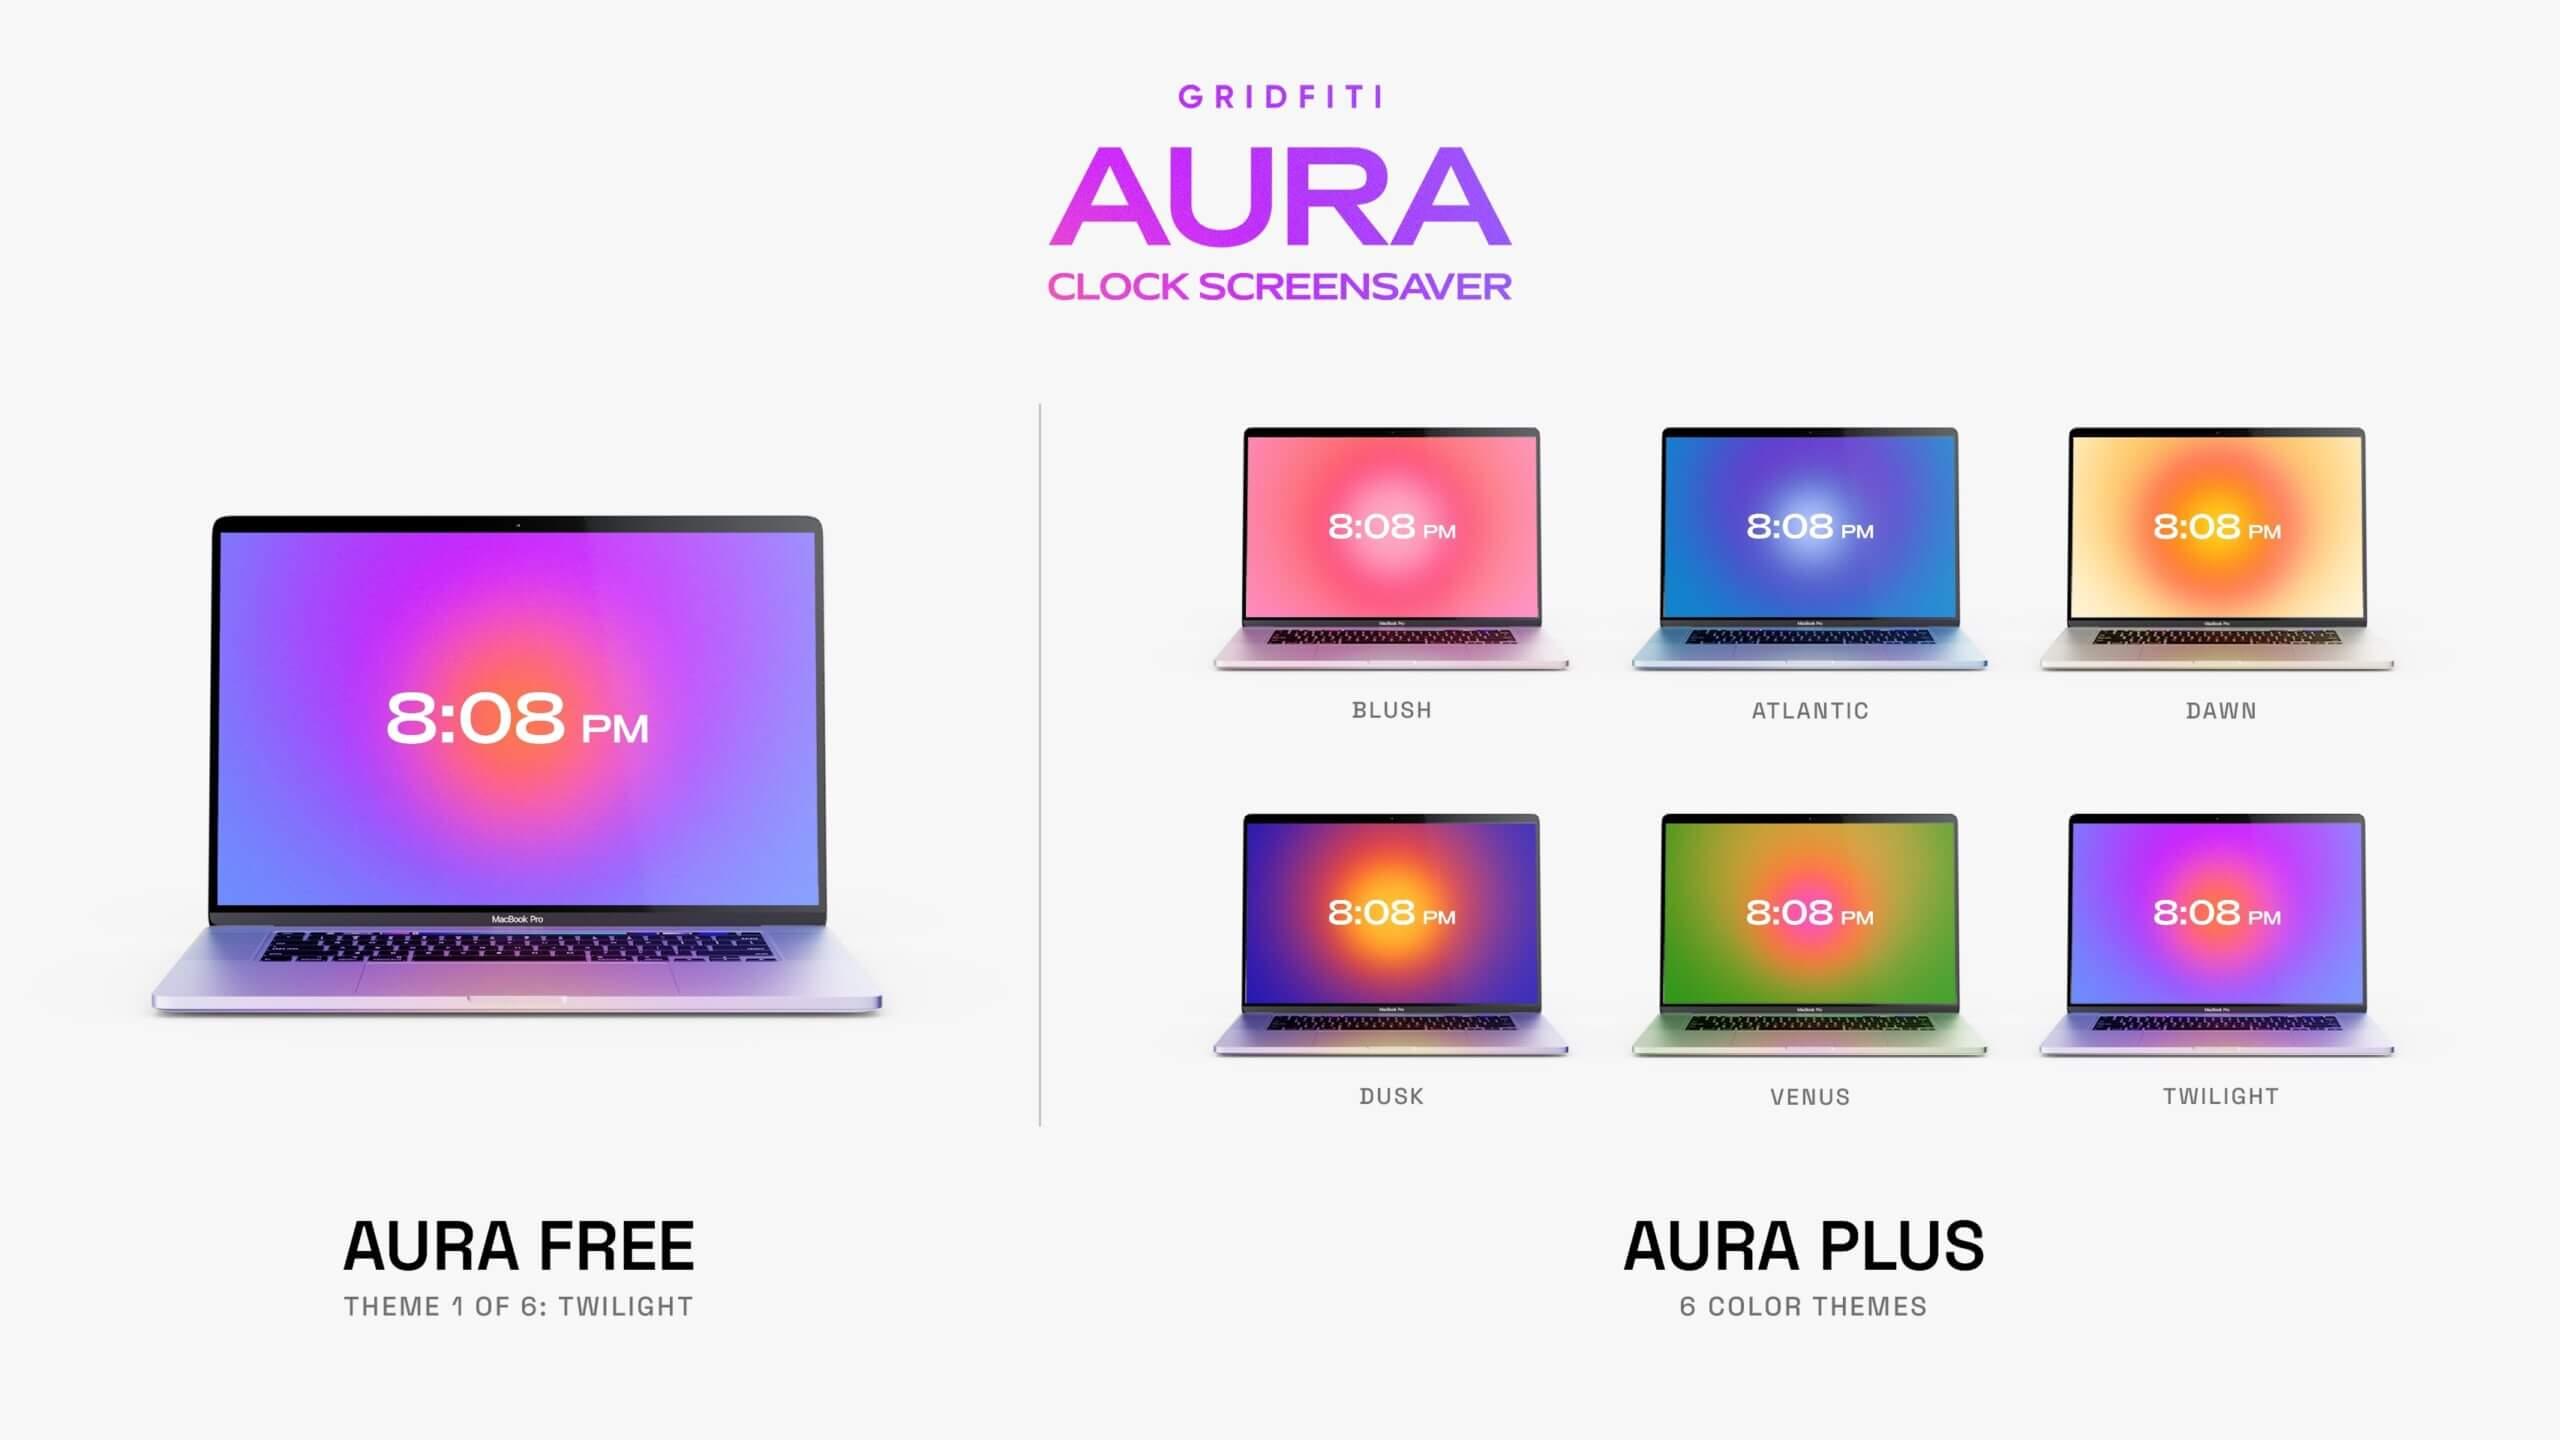 Free Aura Clock Screensaver